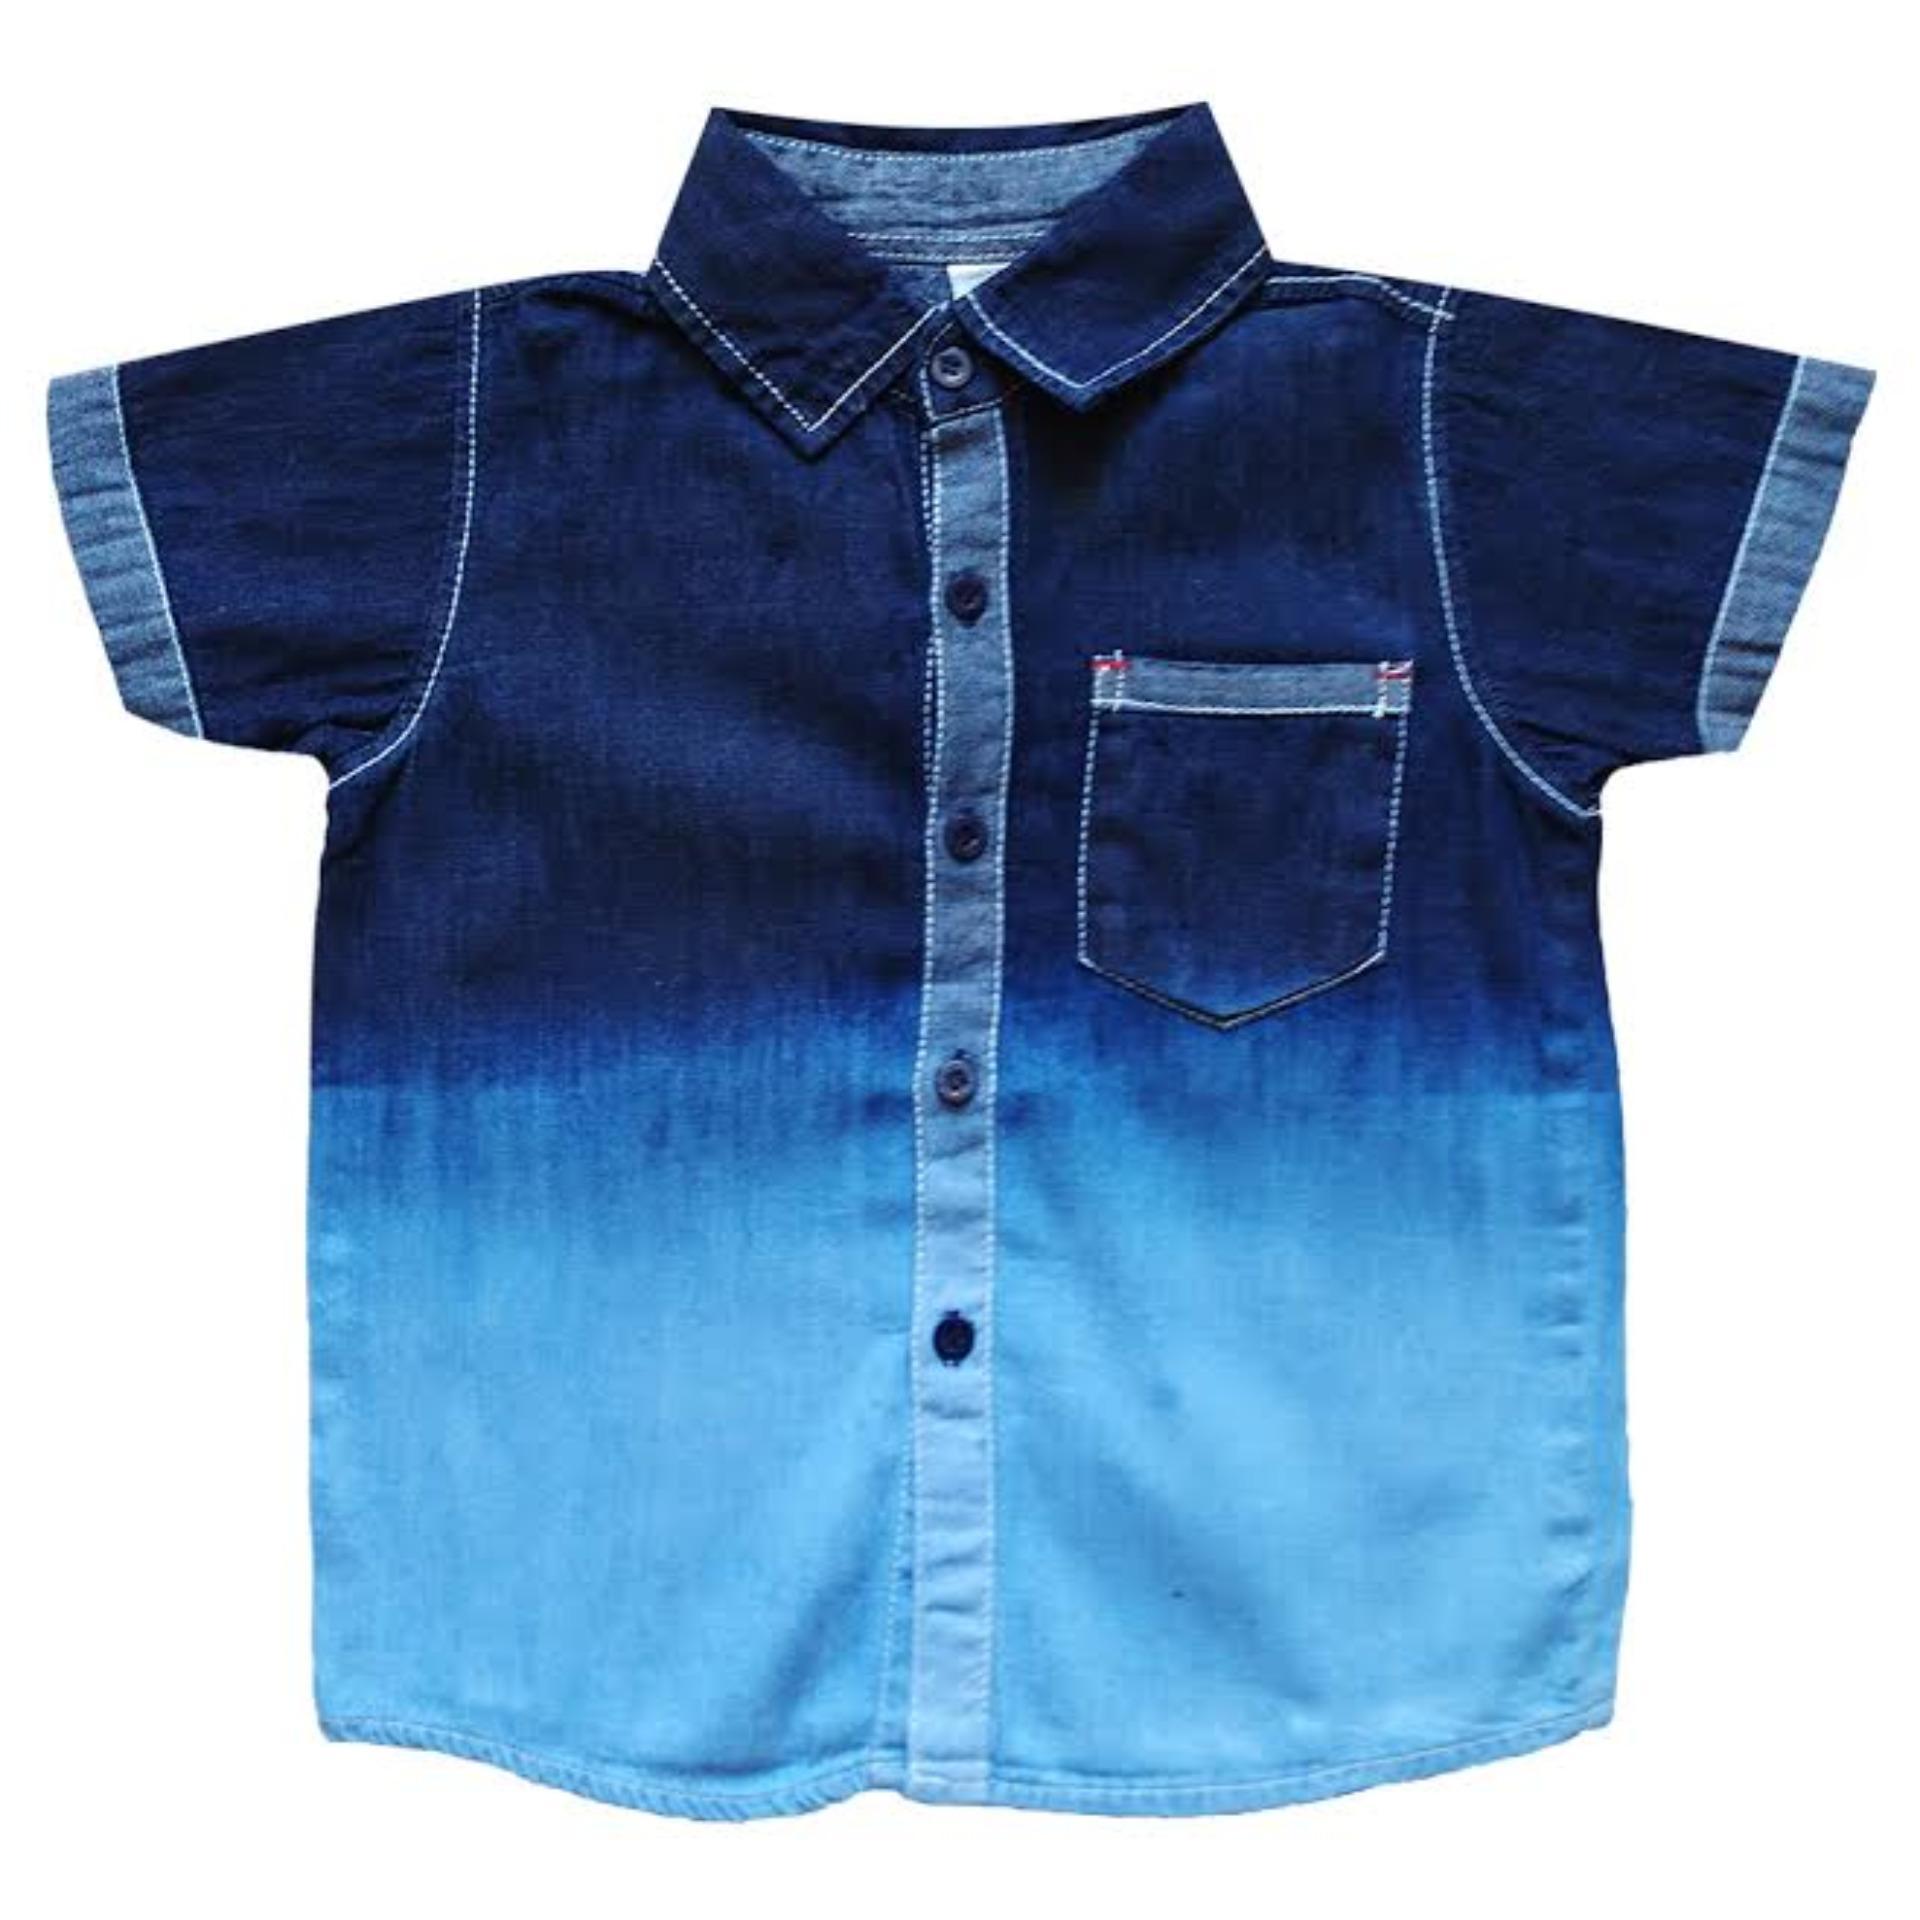 MacBear Kids Baju Anak Kemeja Denim Polos Variasi Ombre